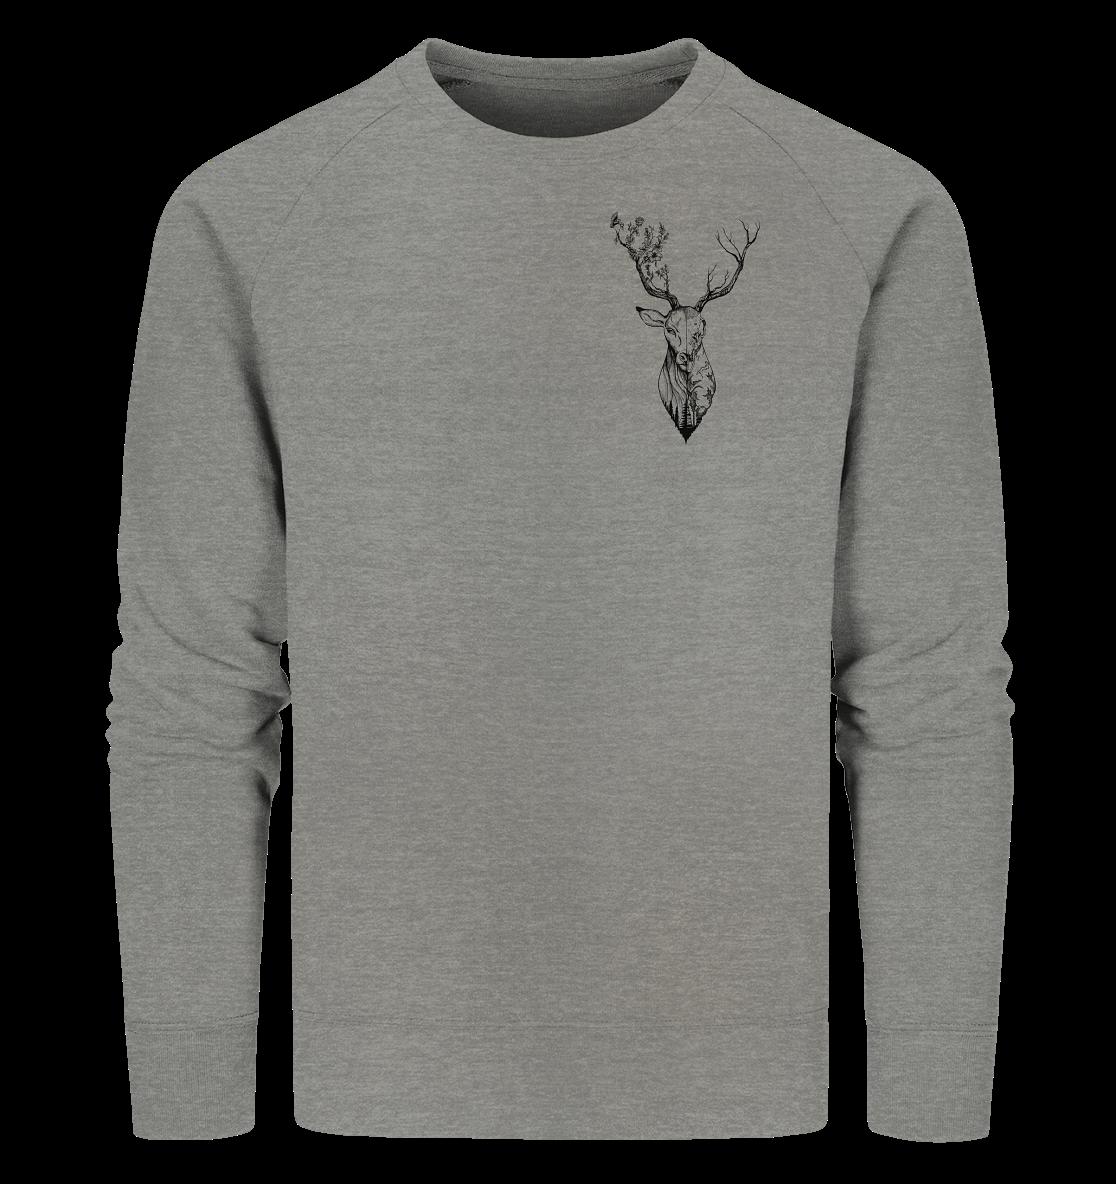 front-organic-sweatshirt-818381-1116x-6.png